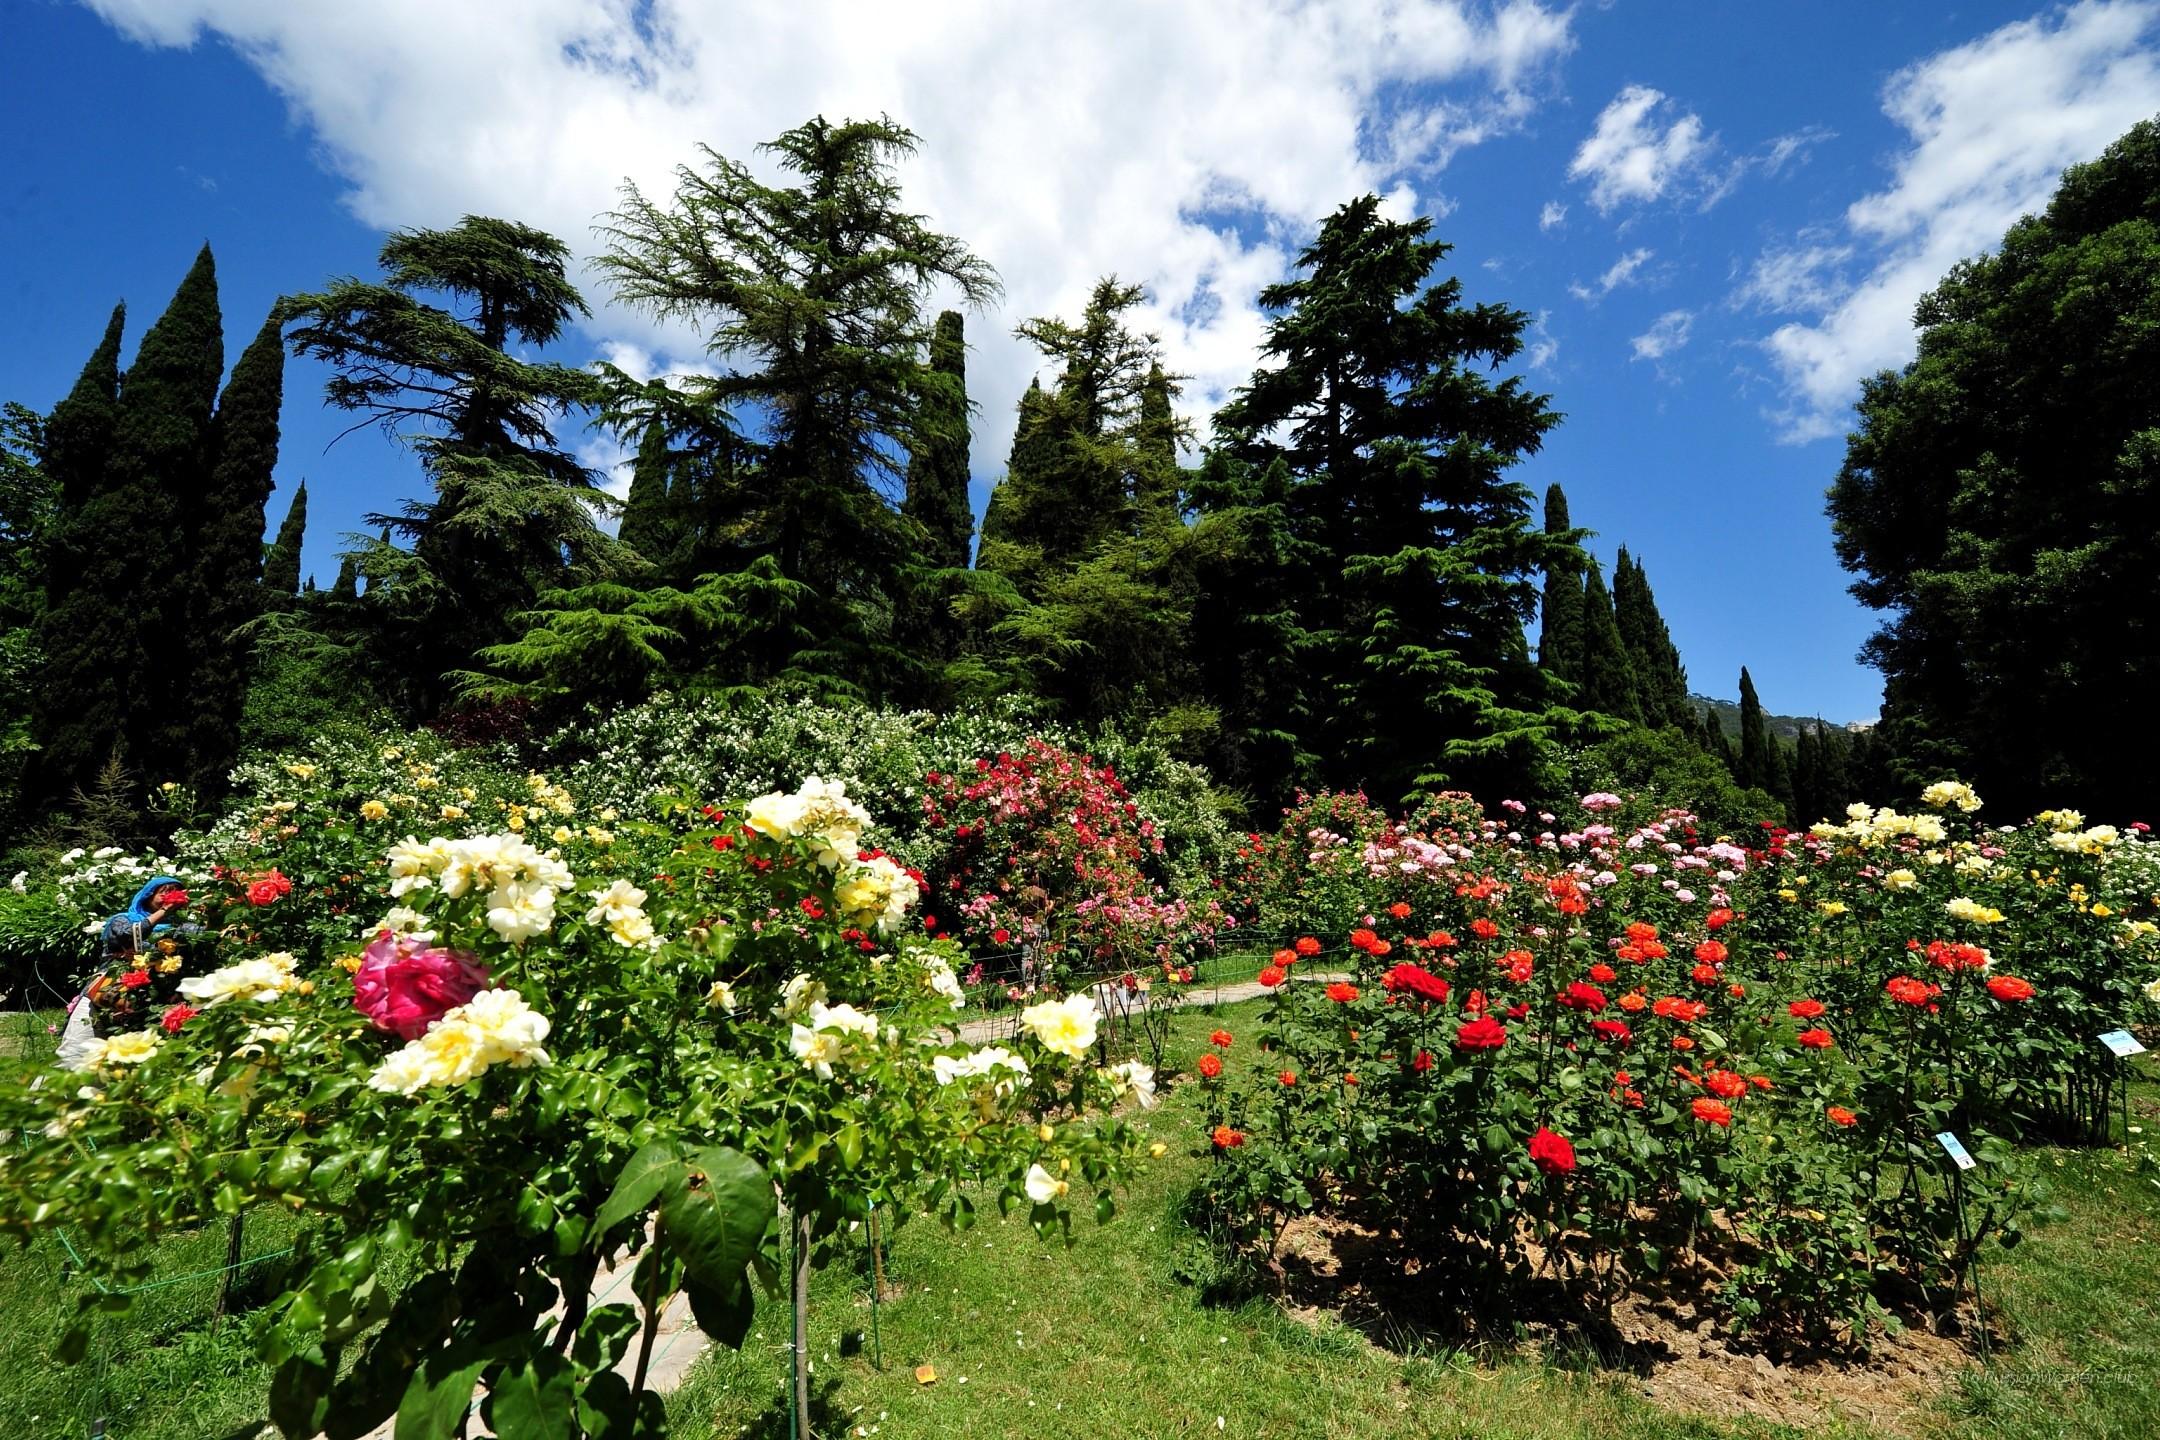 Sfondi estivi 83 immagini for Immagini per cellulari gratis